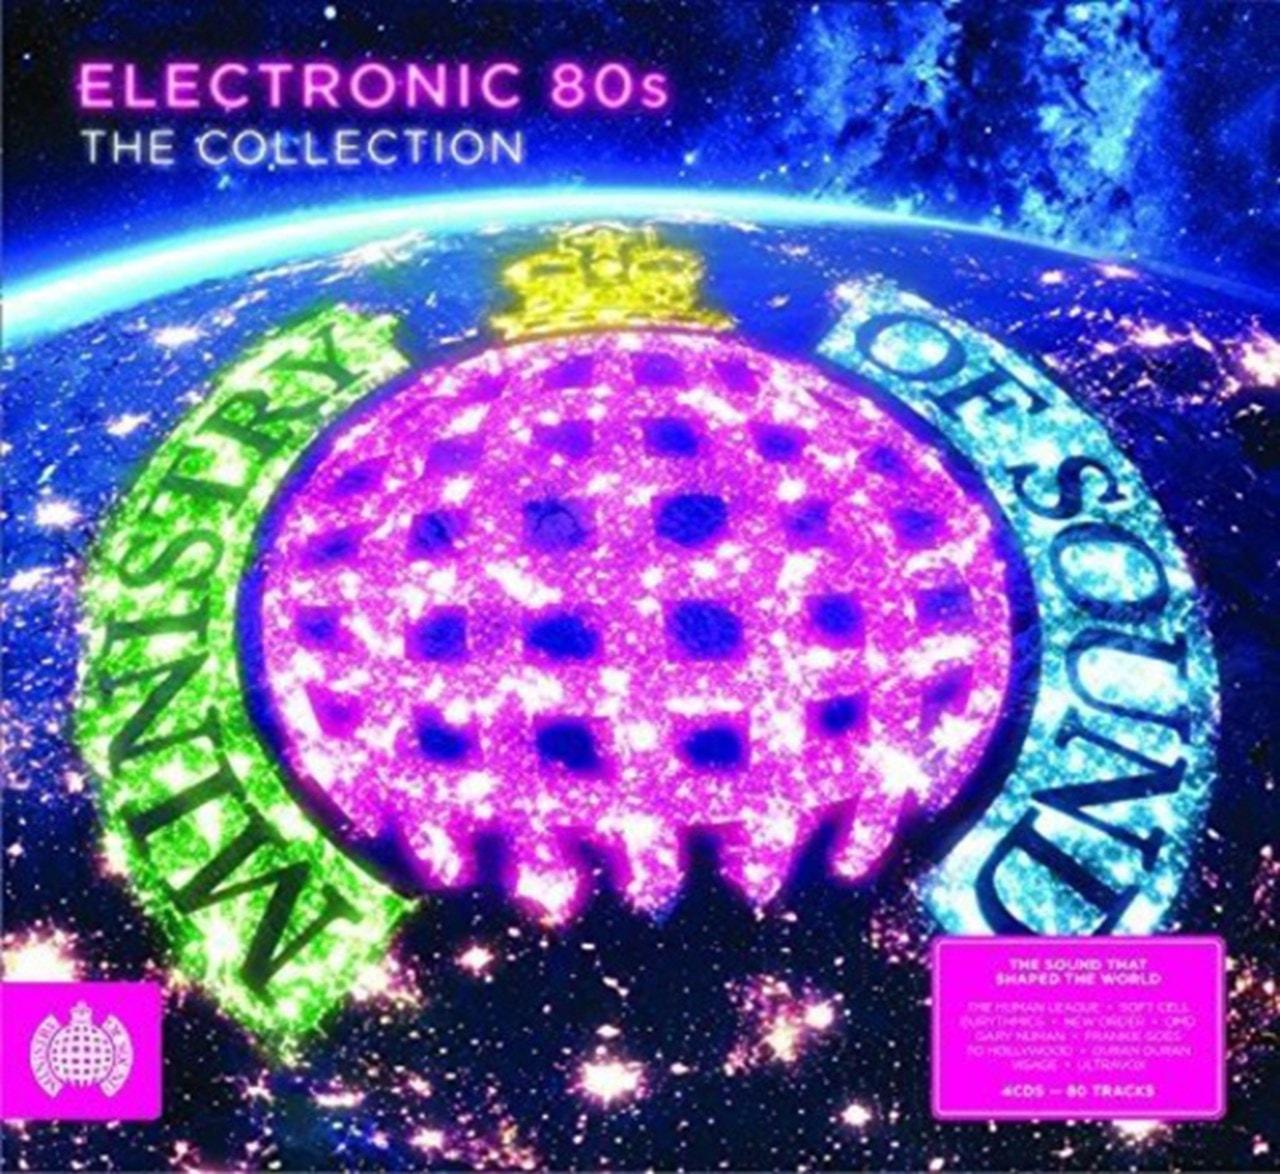 Electronic 80s - 1